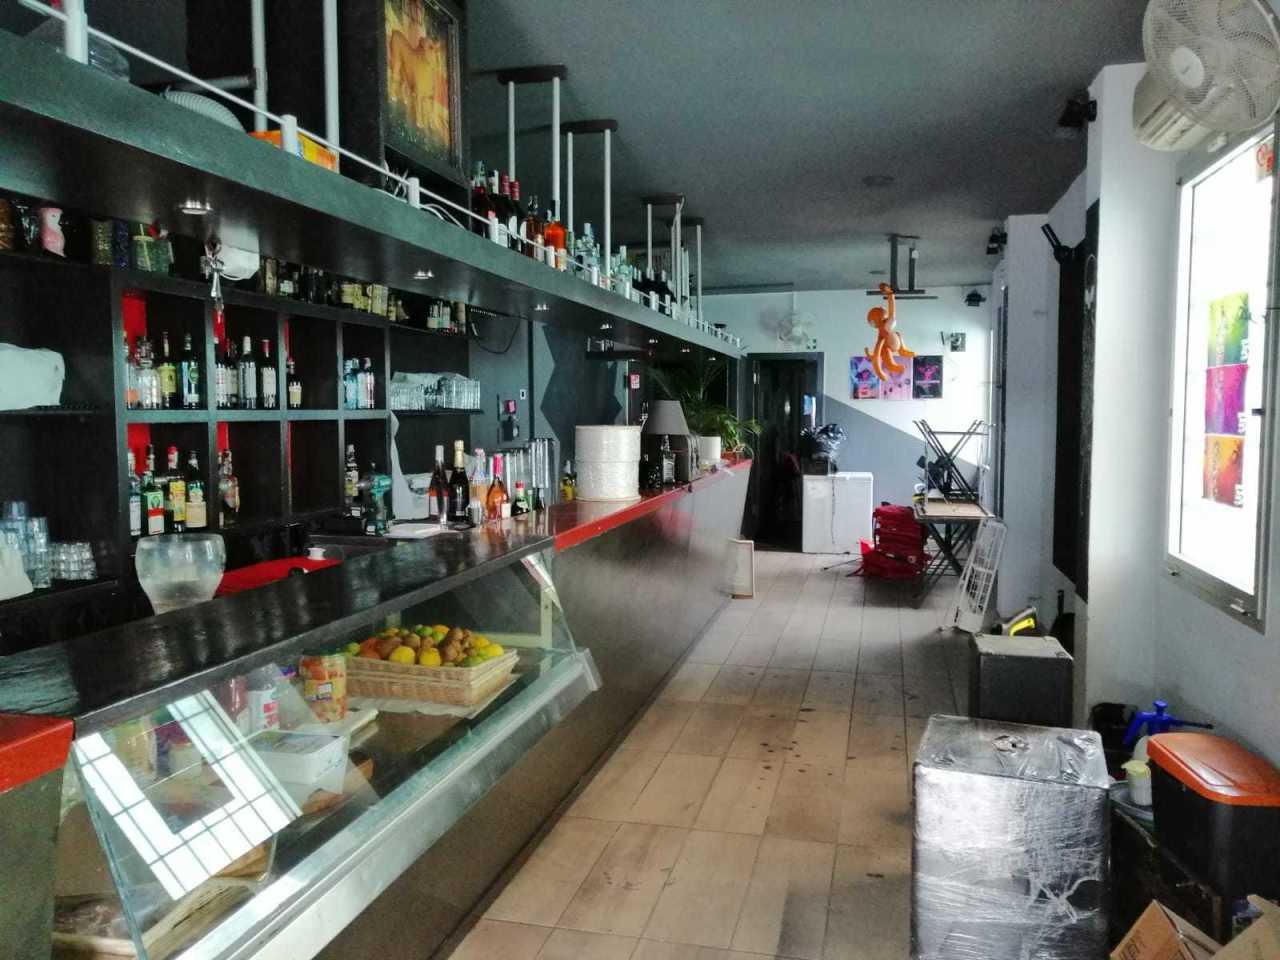 Pub a Viareggio Sud, Viareggio Rif. 10412668